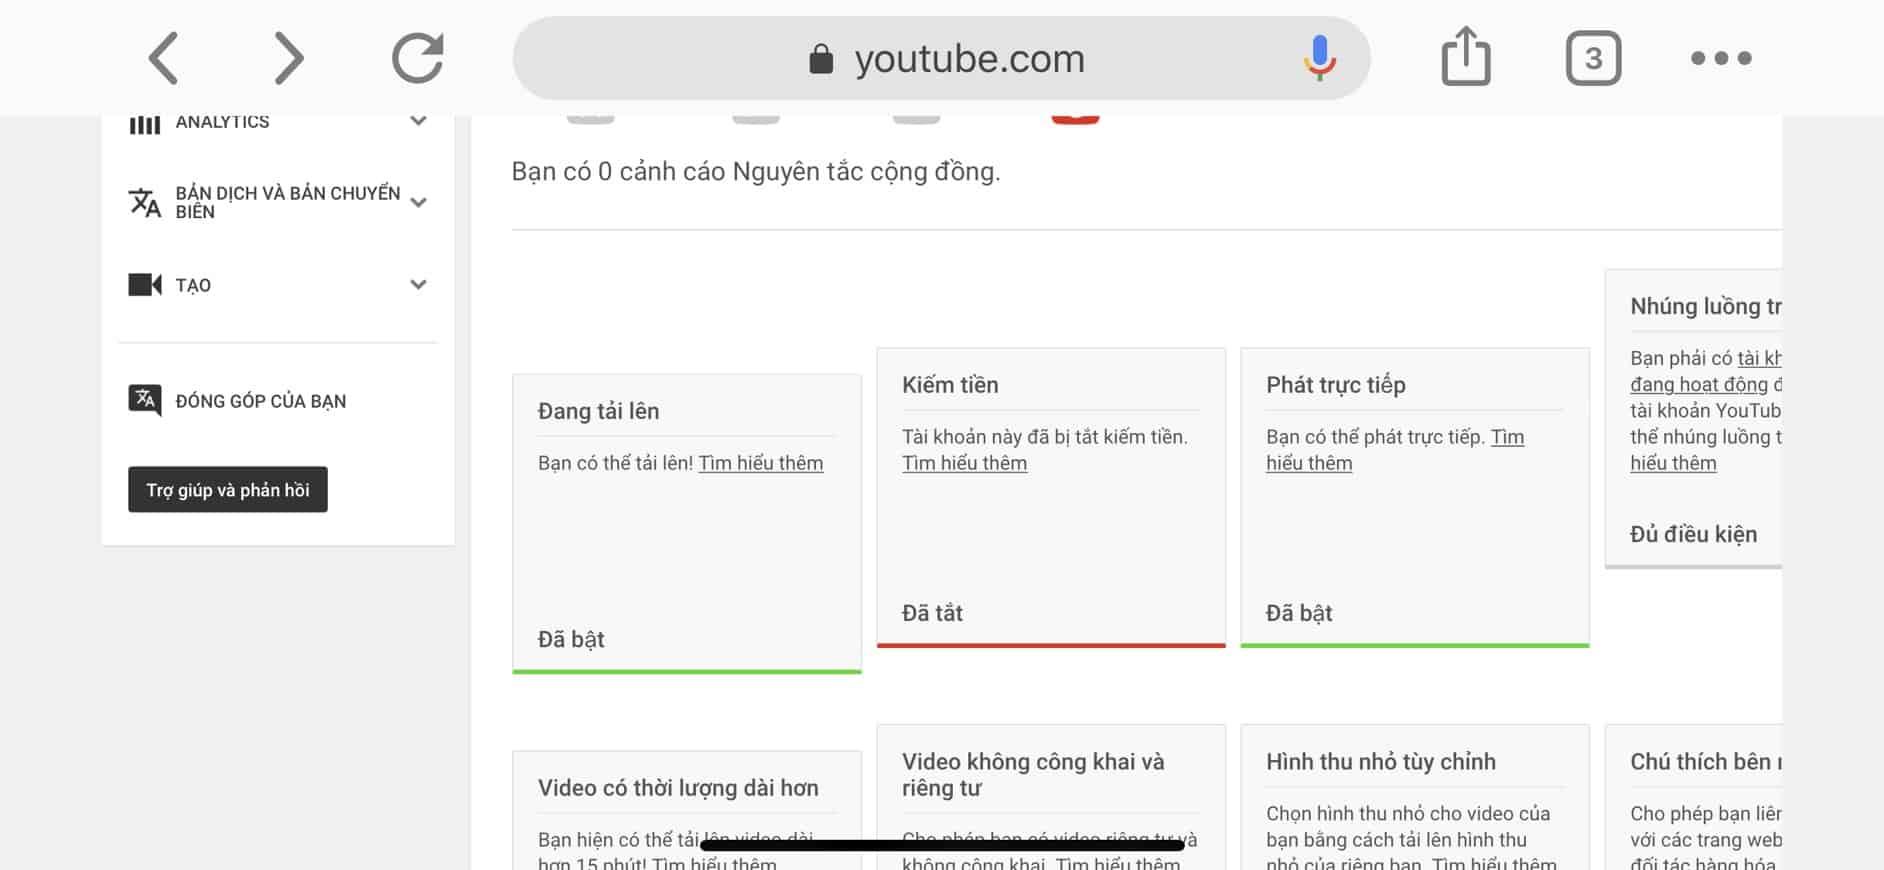 Sua loi tat kiem tien do trung Adsense Youtube